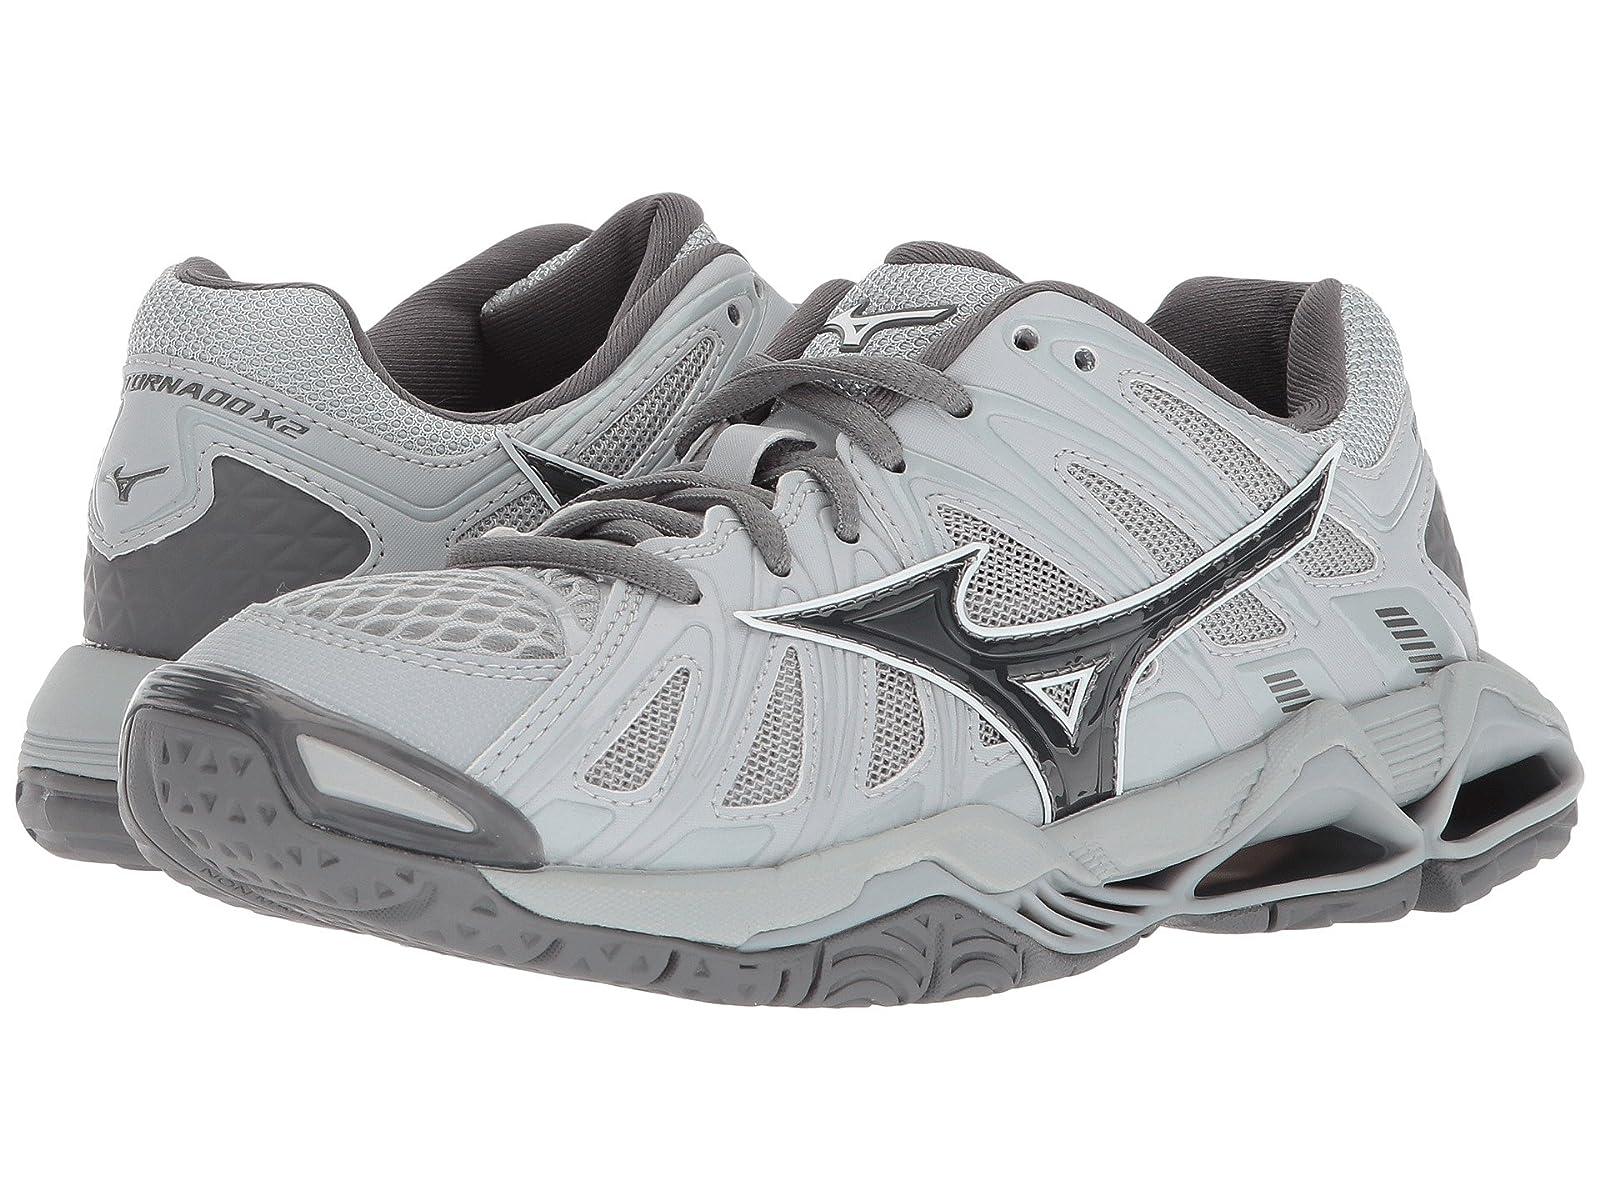 Mizuno Wave Tornado X2Atmospheric grades have affordable shoes